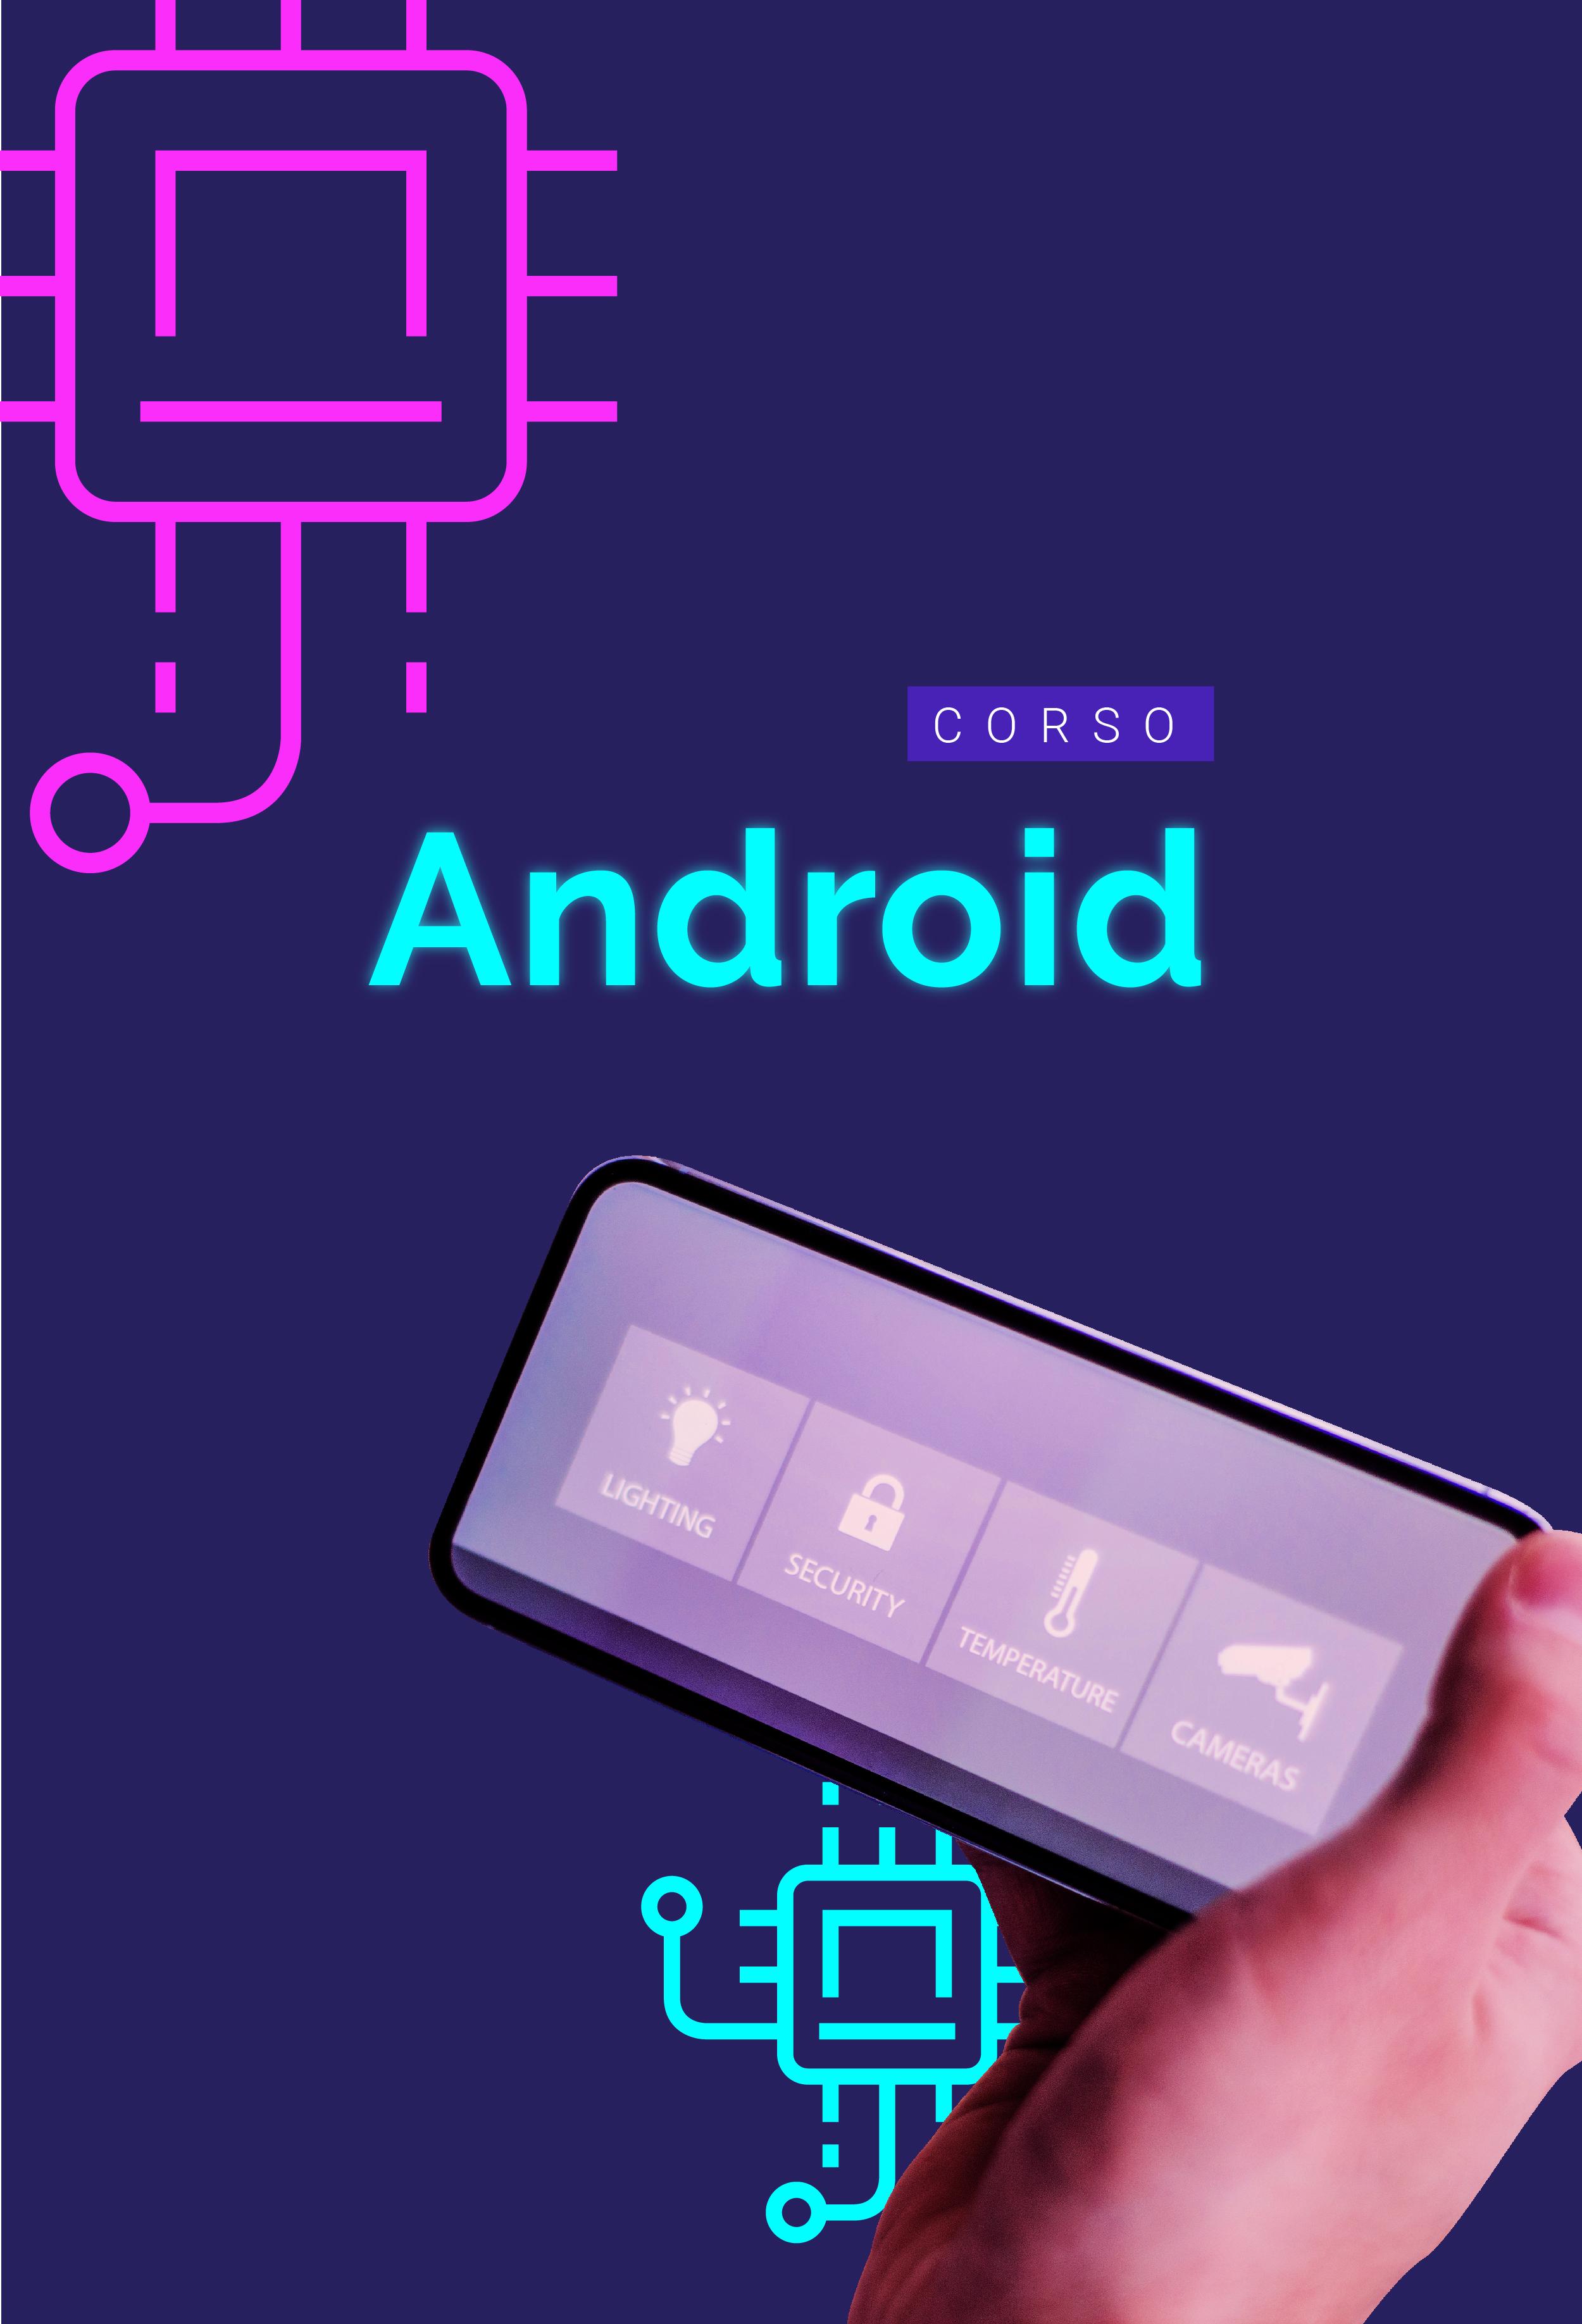 Corso Android Application Development